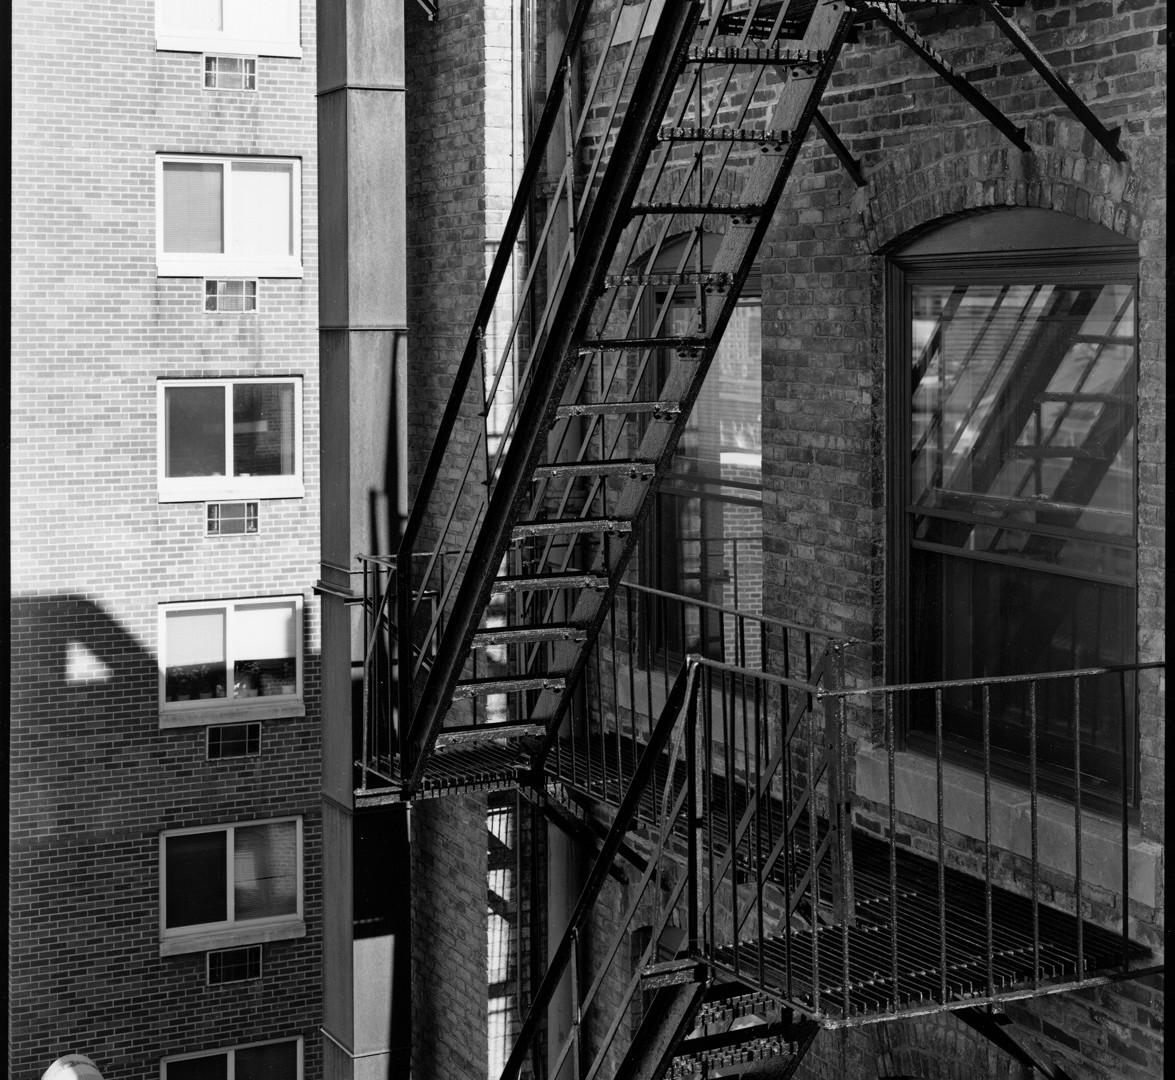 Nicholas Nixon, View behind Bowdoin Street, Boston, 2009